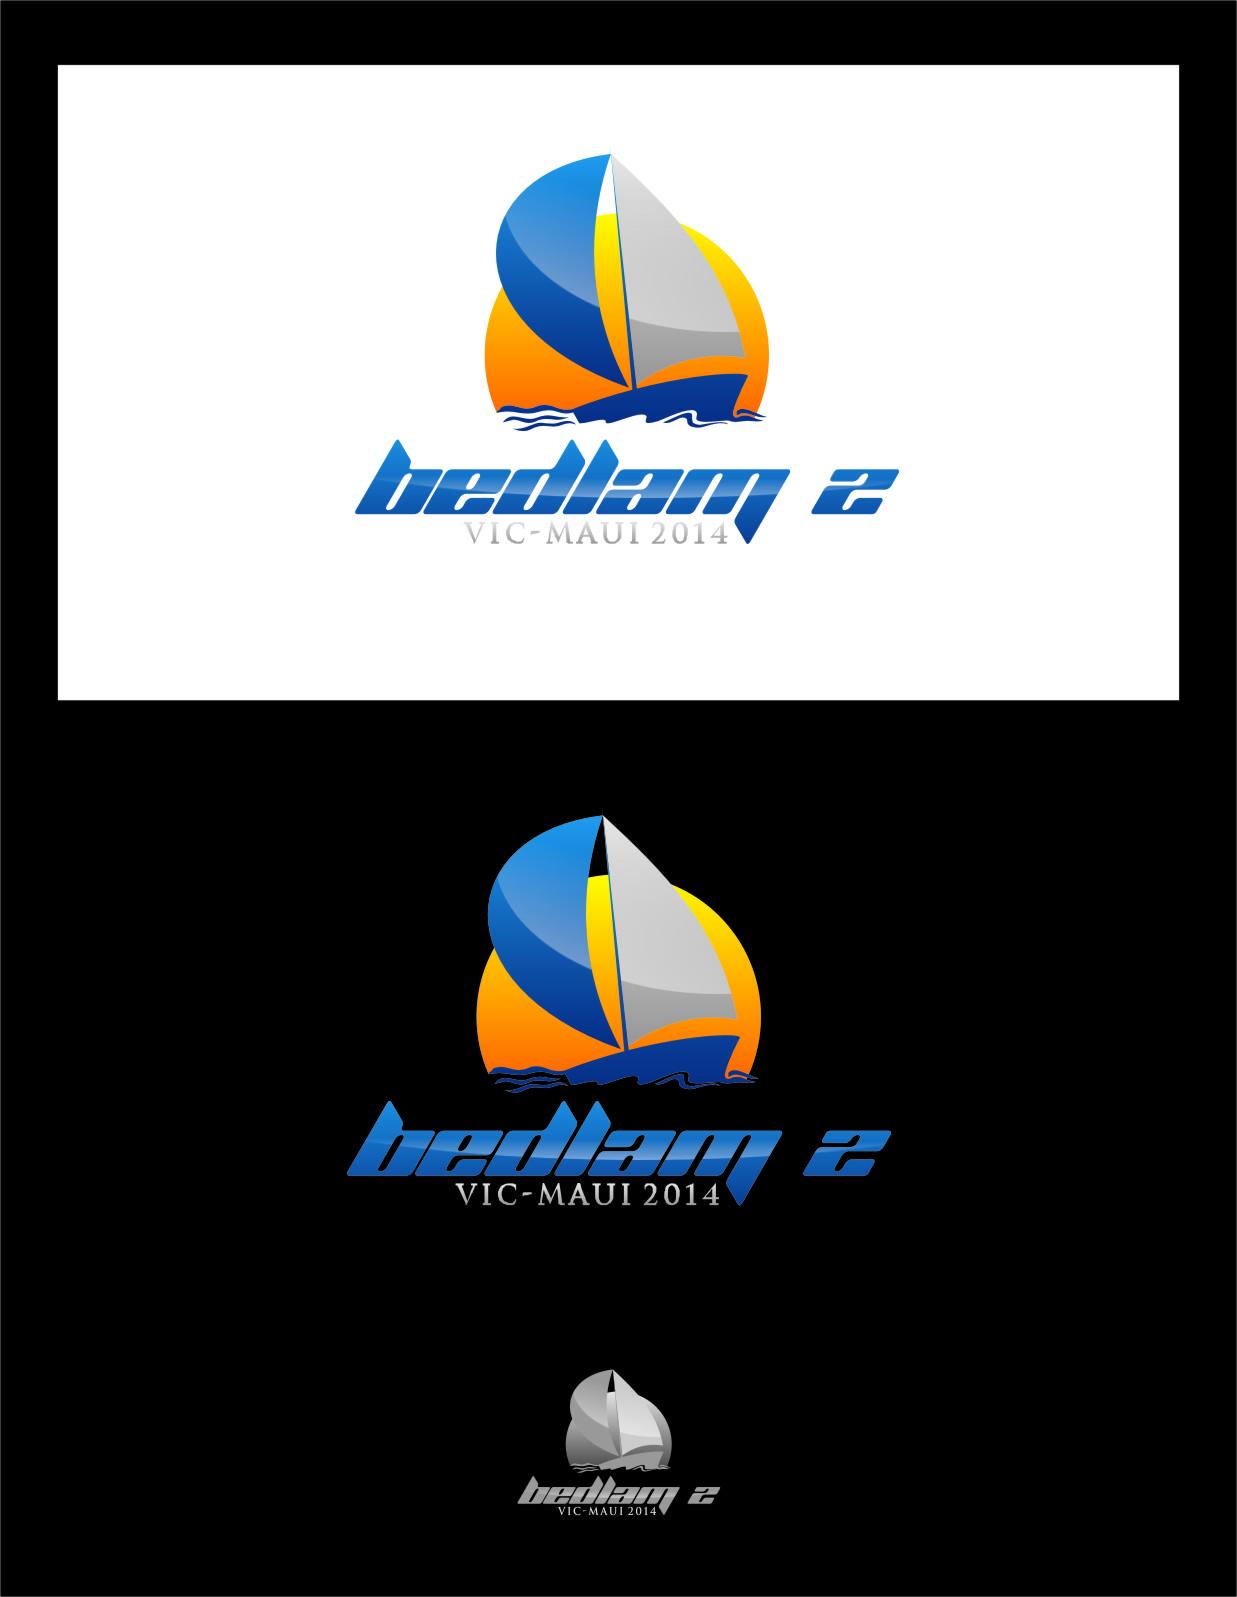 Logo Design by Ngepet_art - Entry No. 45 in the Logo Design Contest Artistic Logo Design for Bedlam 2  Vic-Maui 2014.